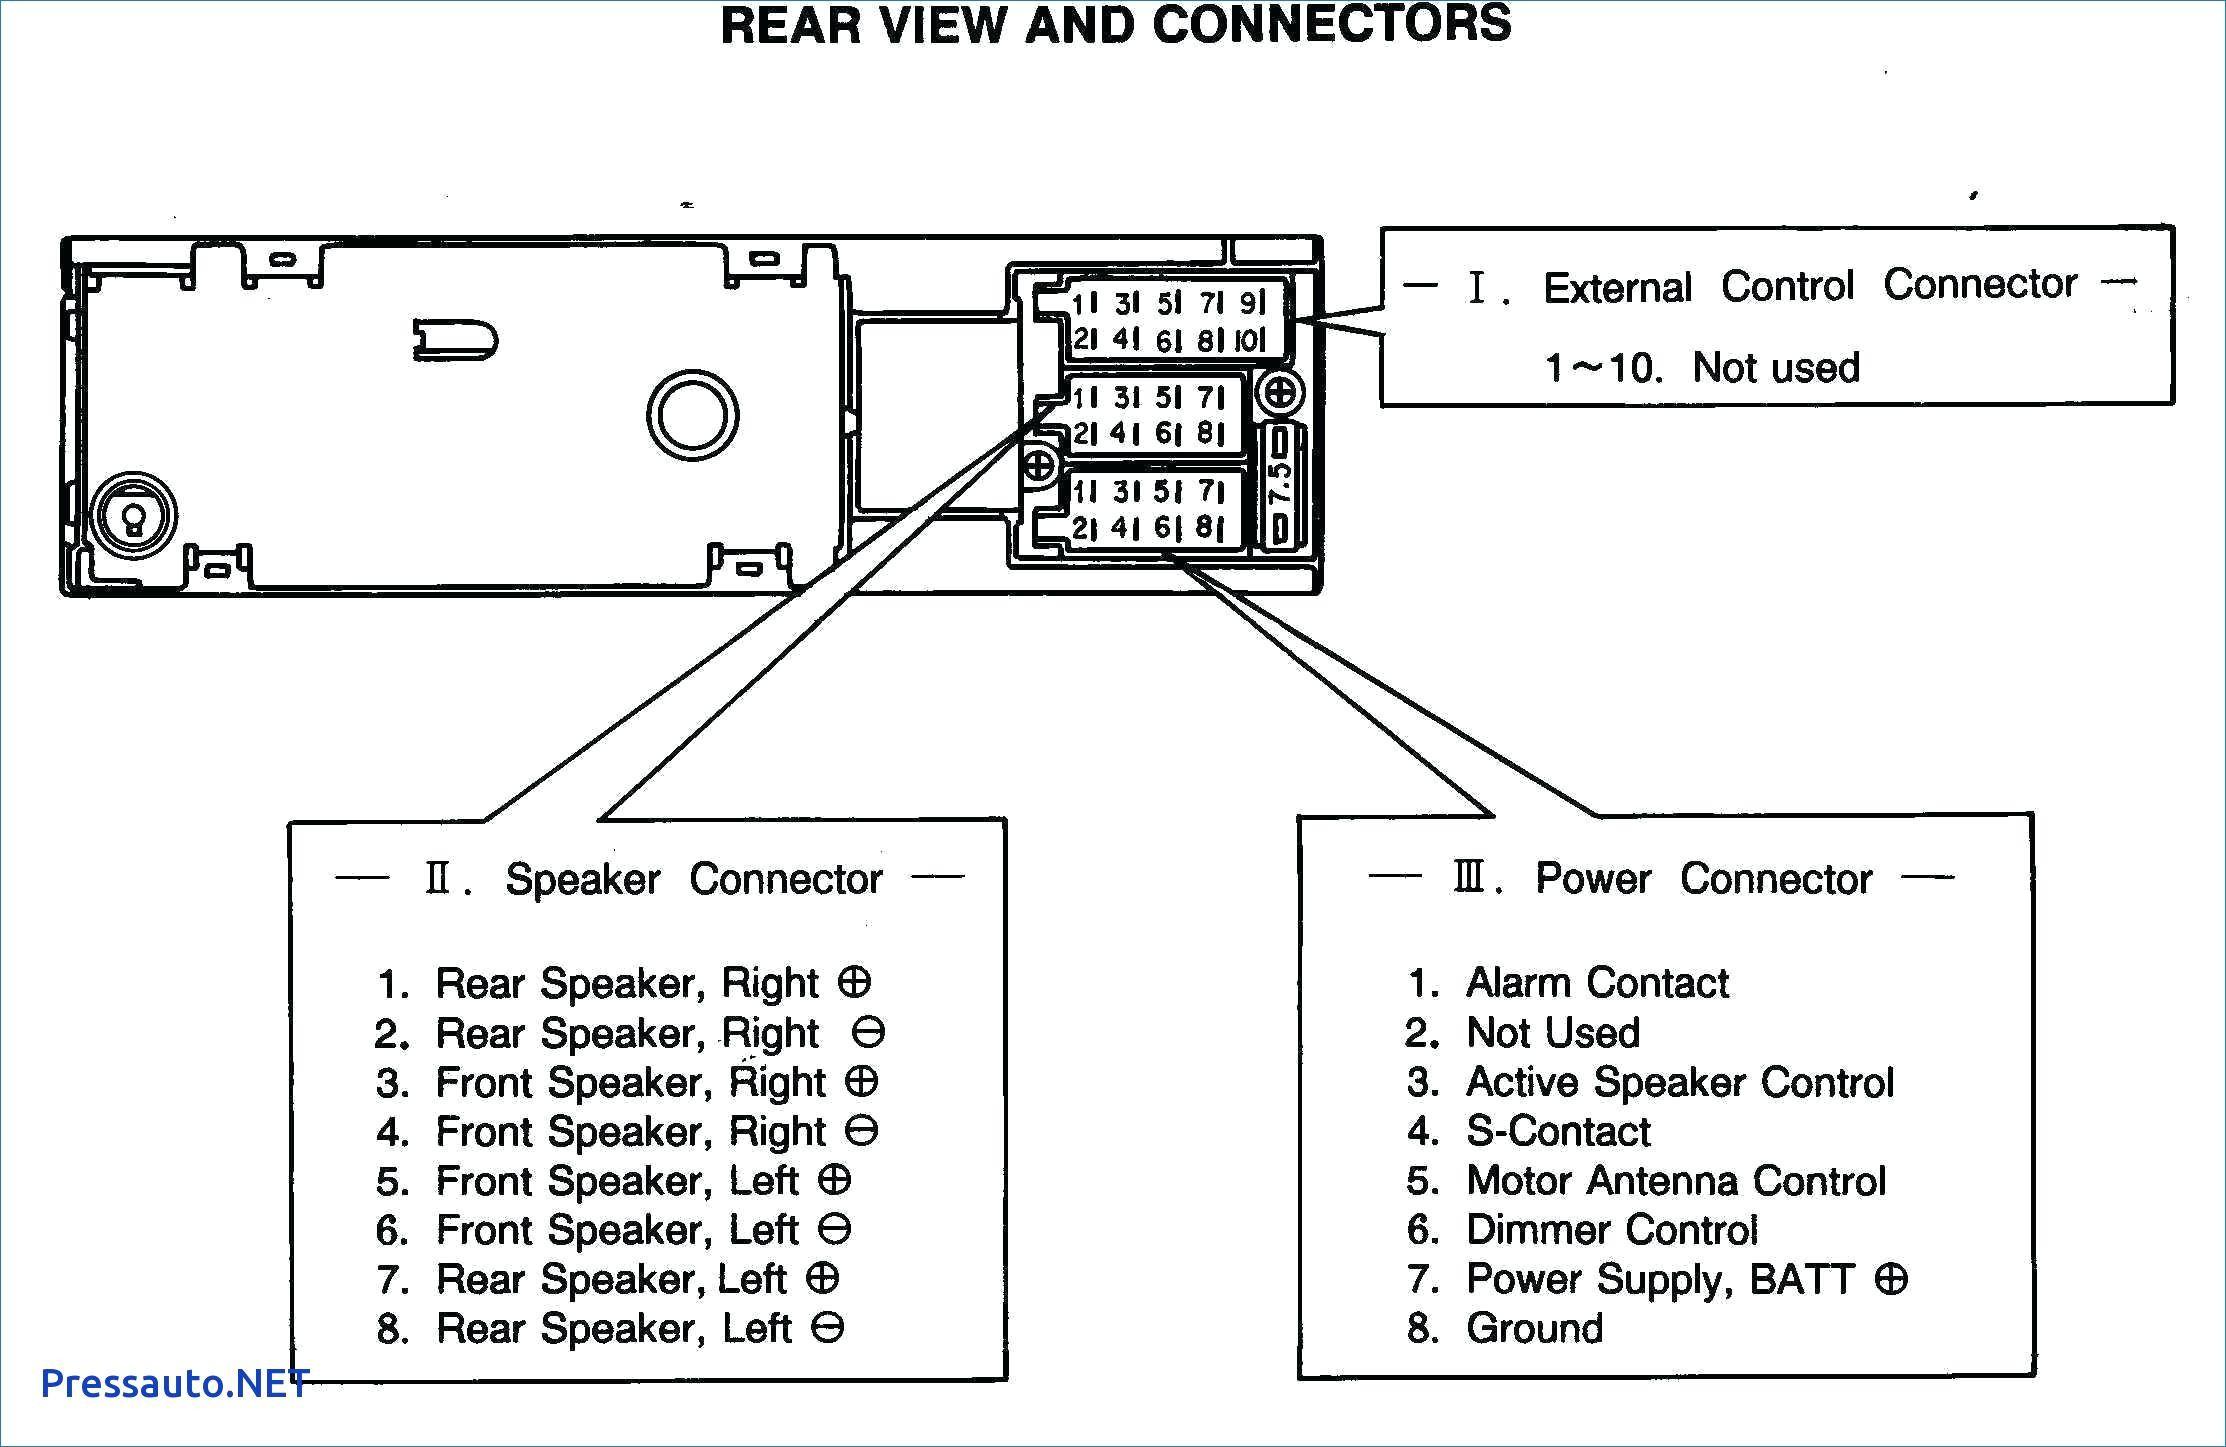 Jeep Grand Cherokee Engine Diagram Kia Spectra Wiring 1999 Diagrams Starter 2003 Sensor Forum Of